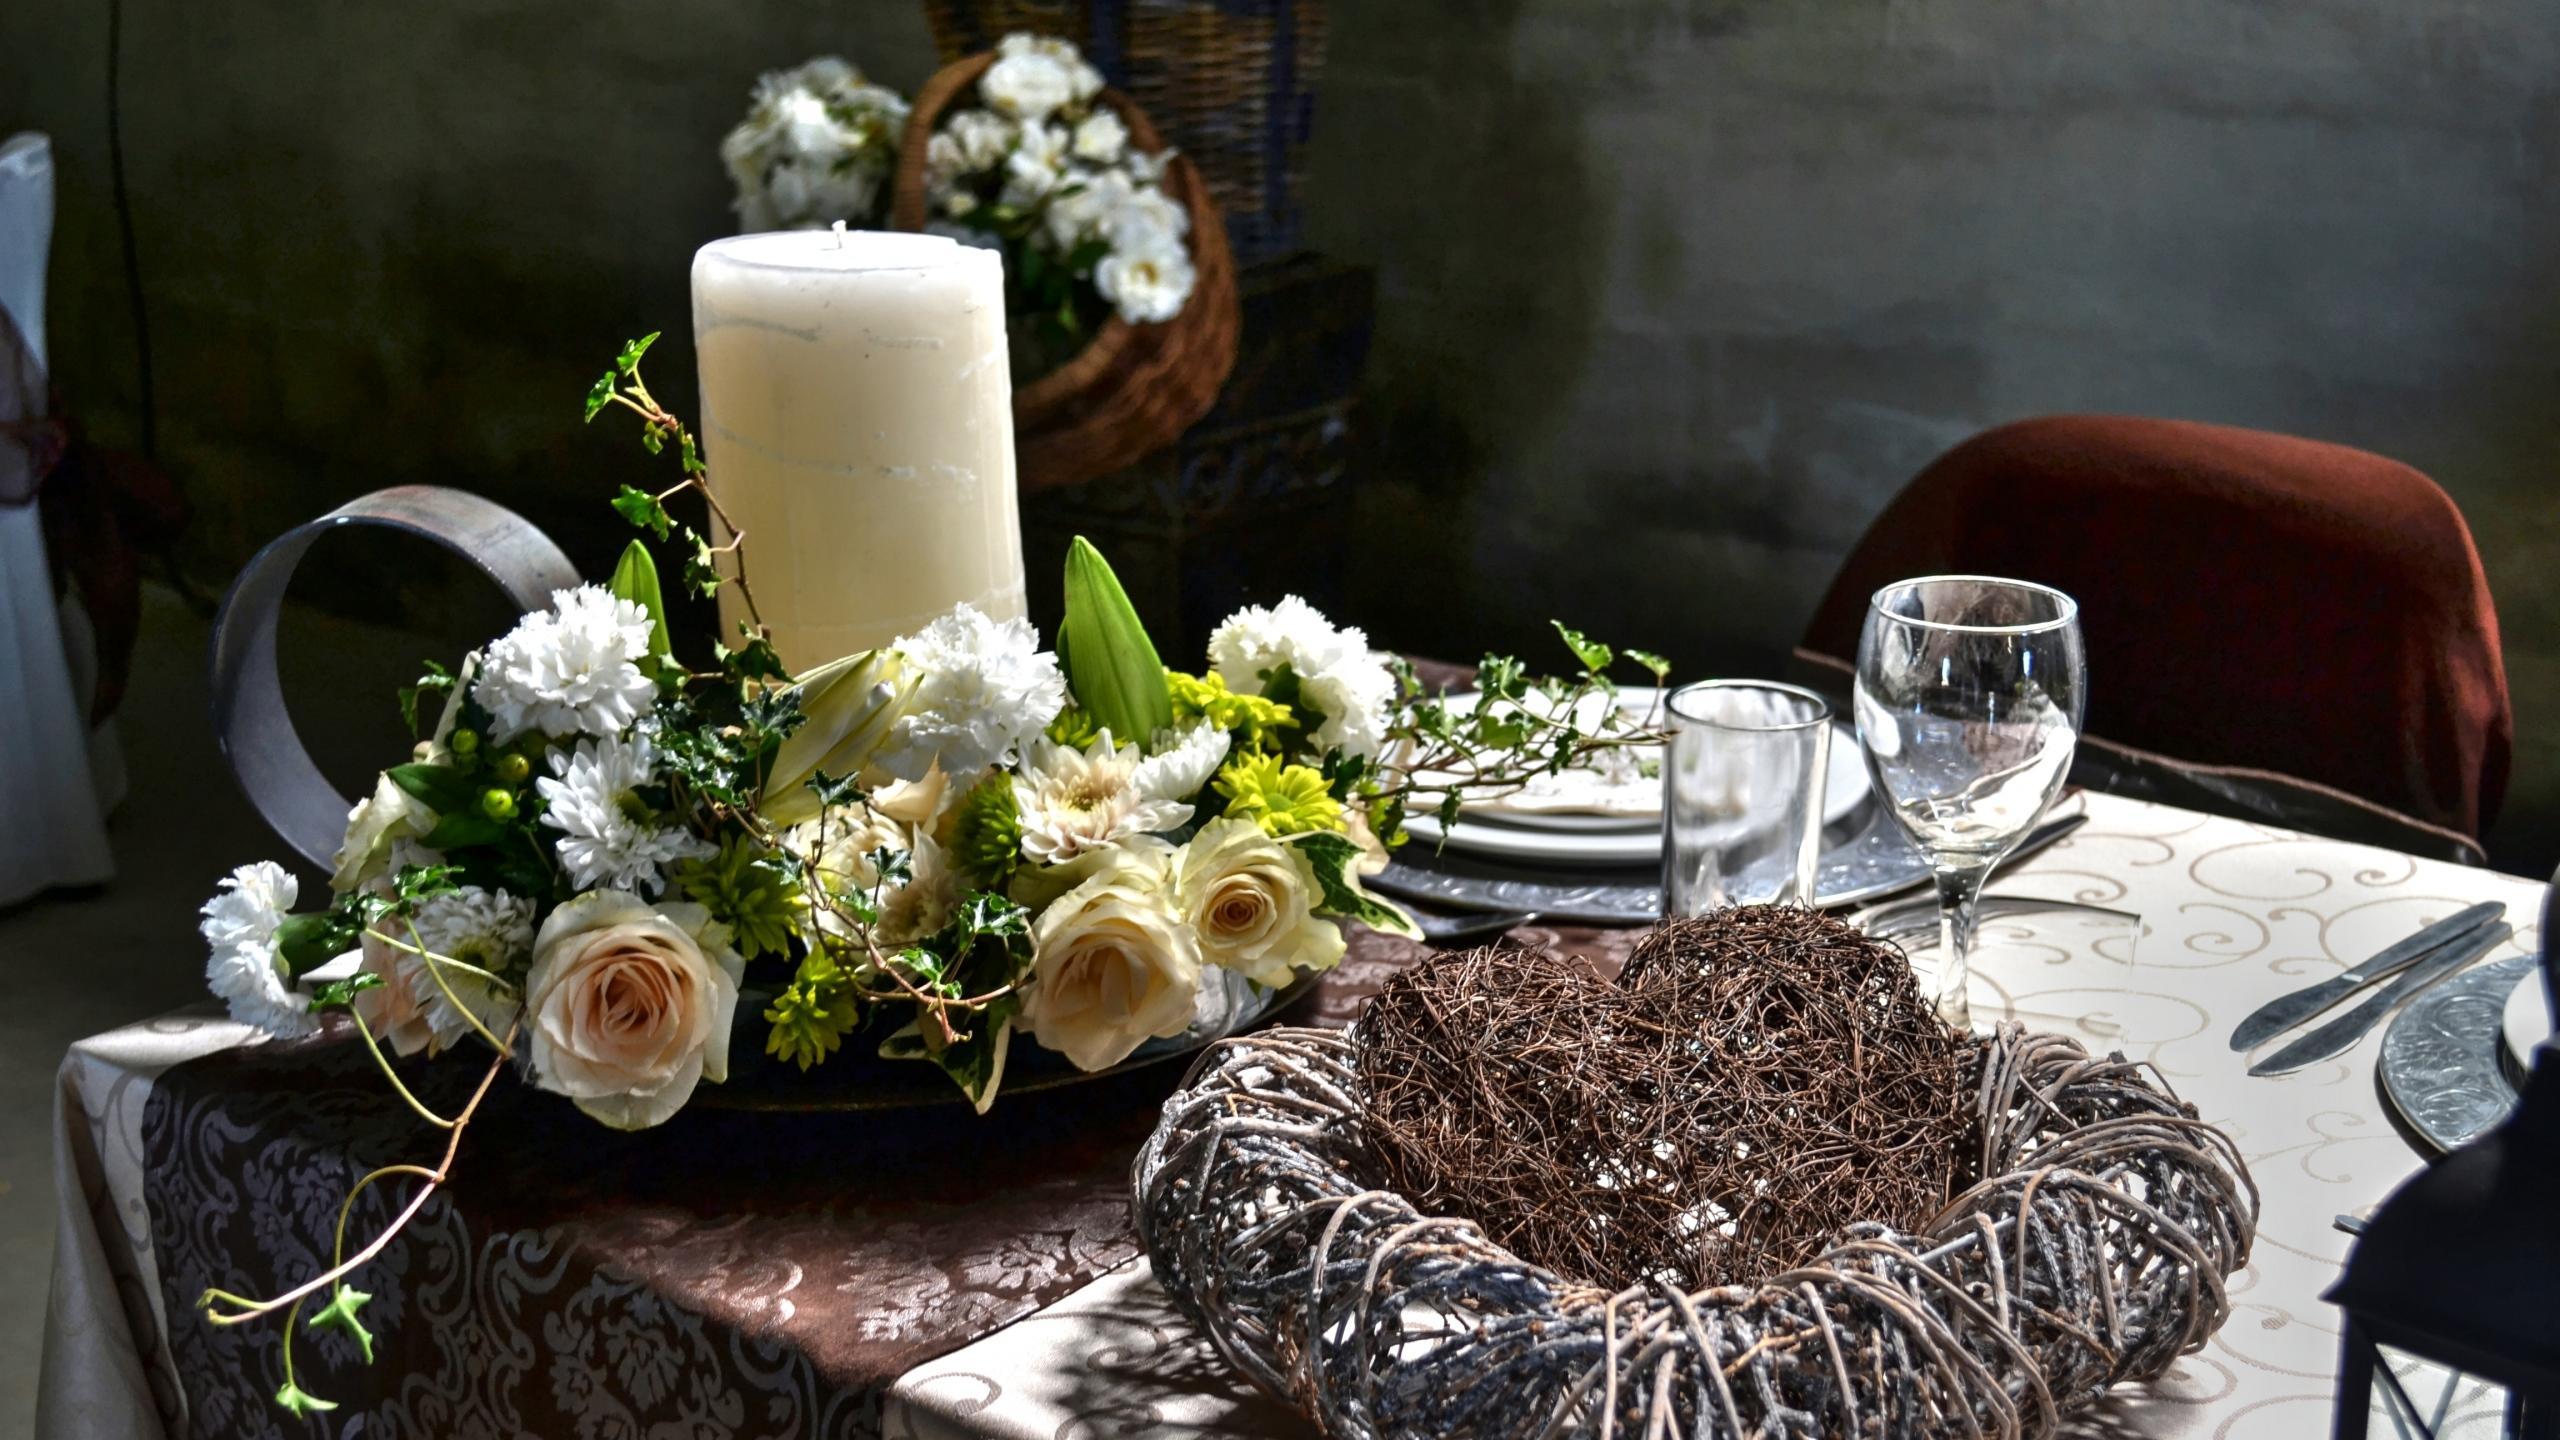 обои сервировка, декор, стол, цветы картинки фото